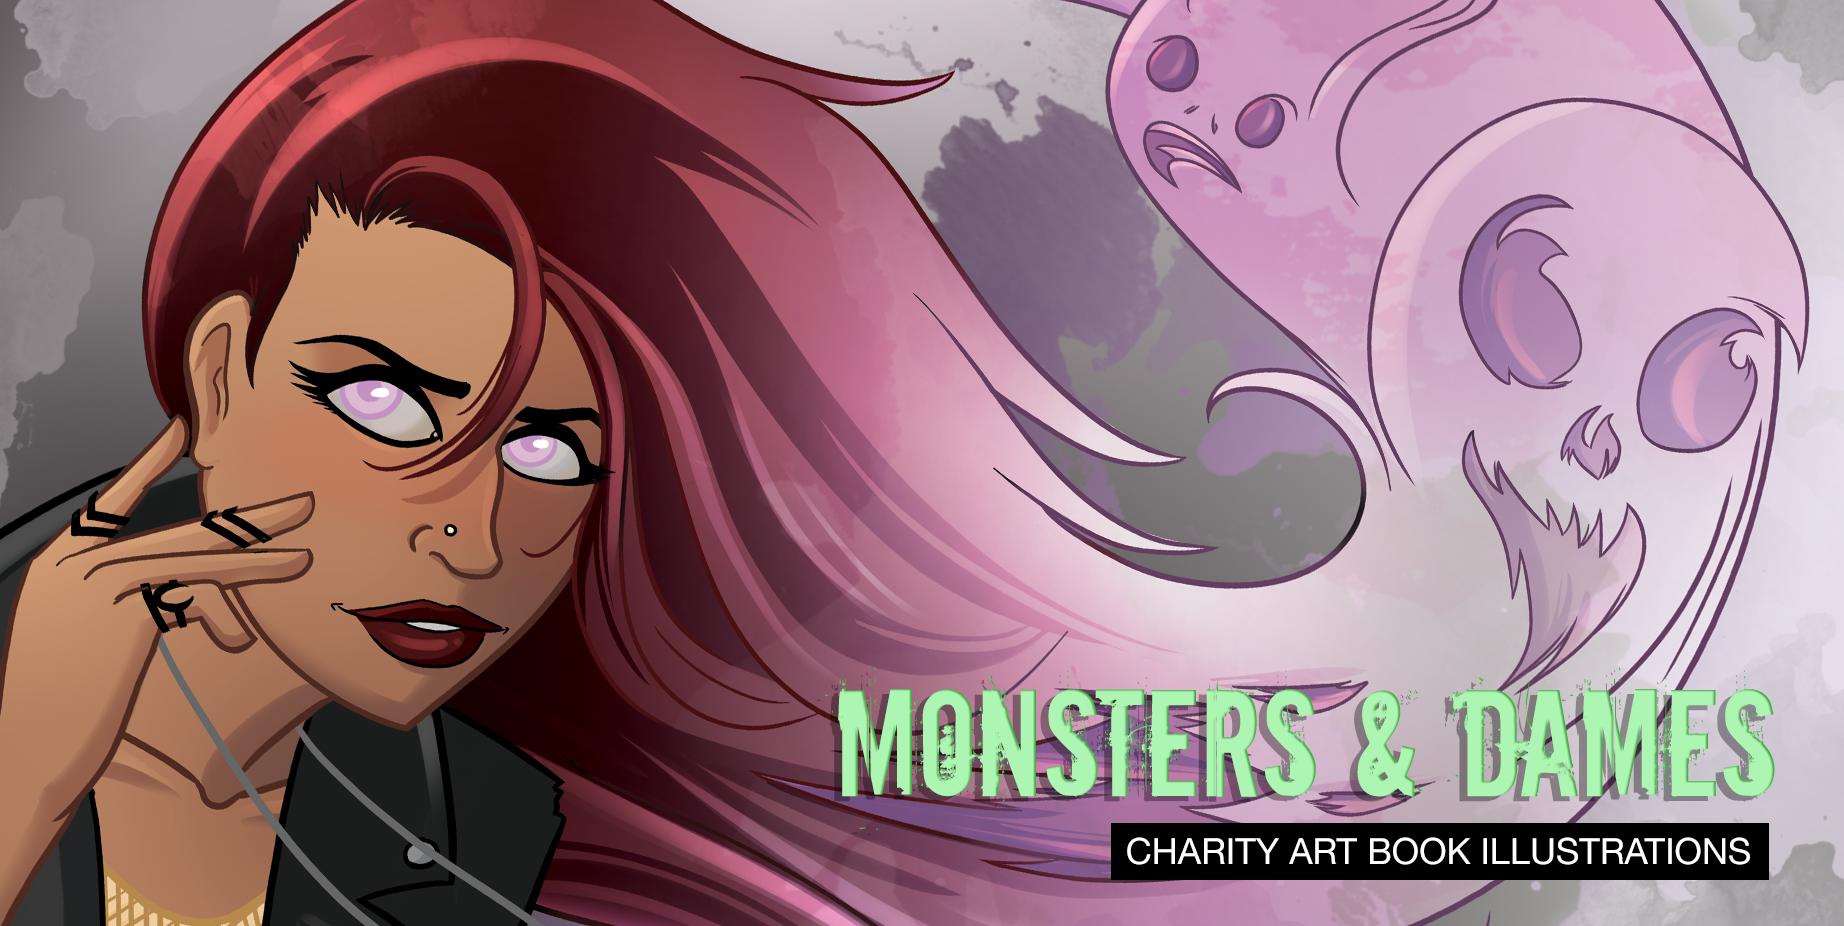 MonstersAndDames-DenisCaron-Art-2017-Illustrations.png